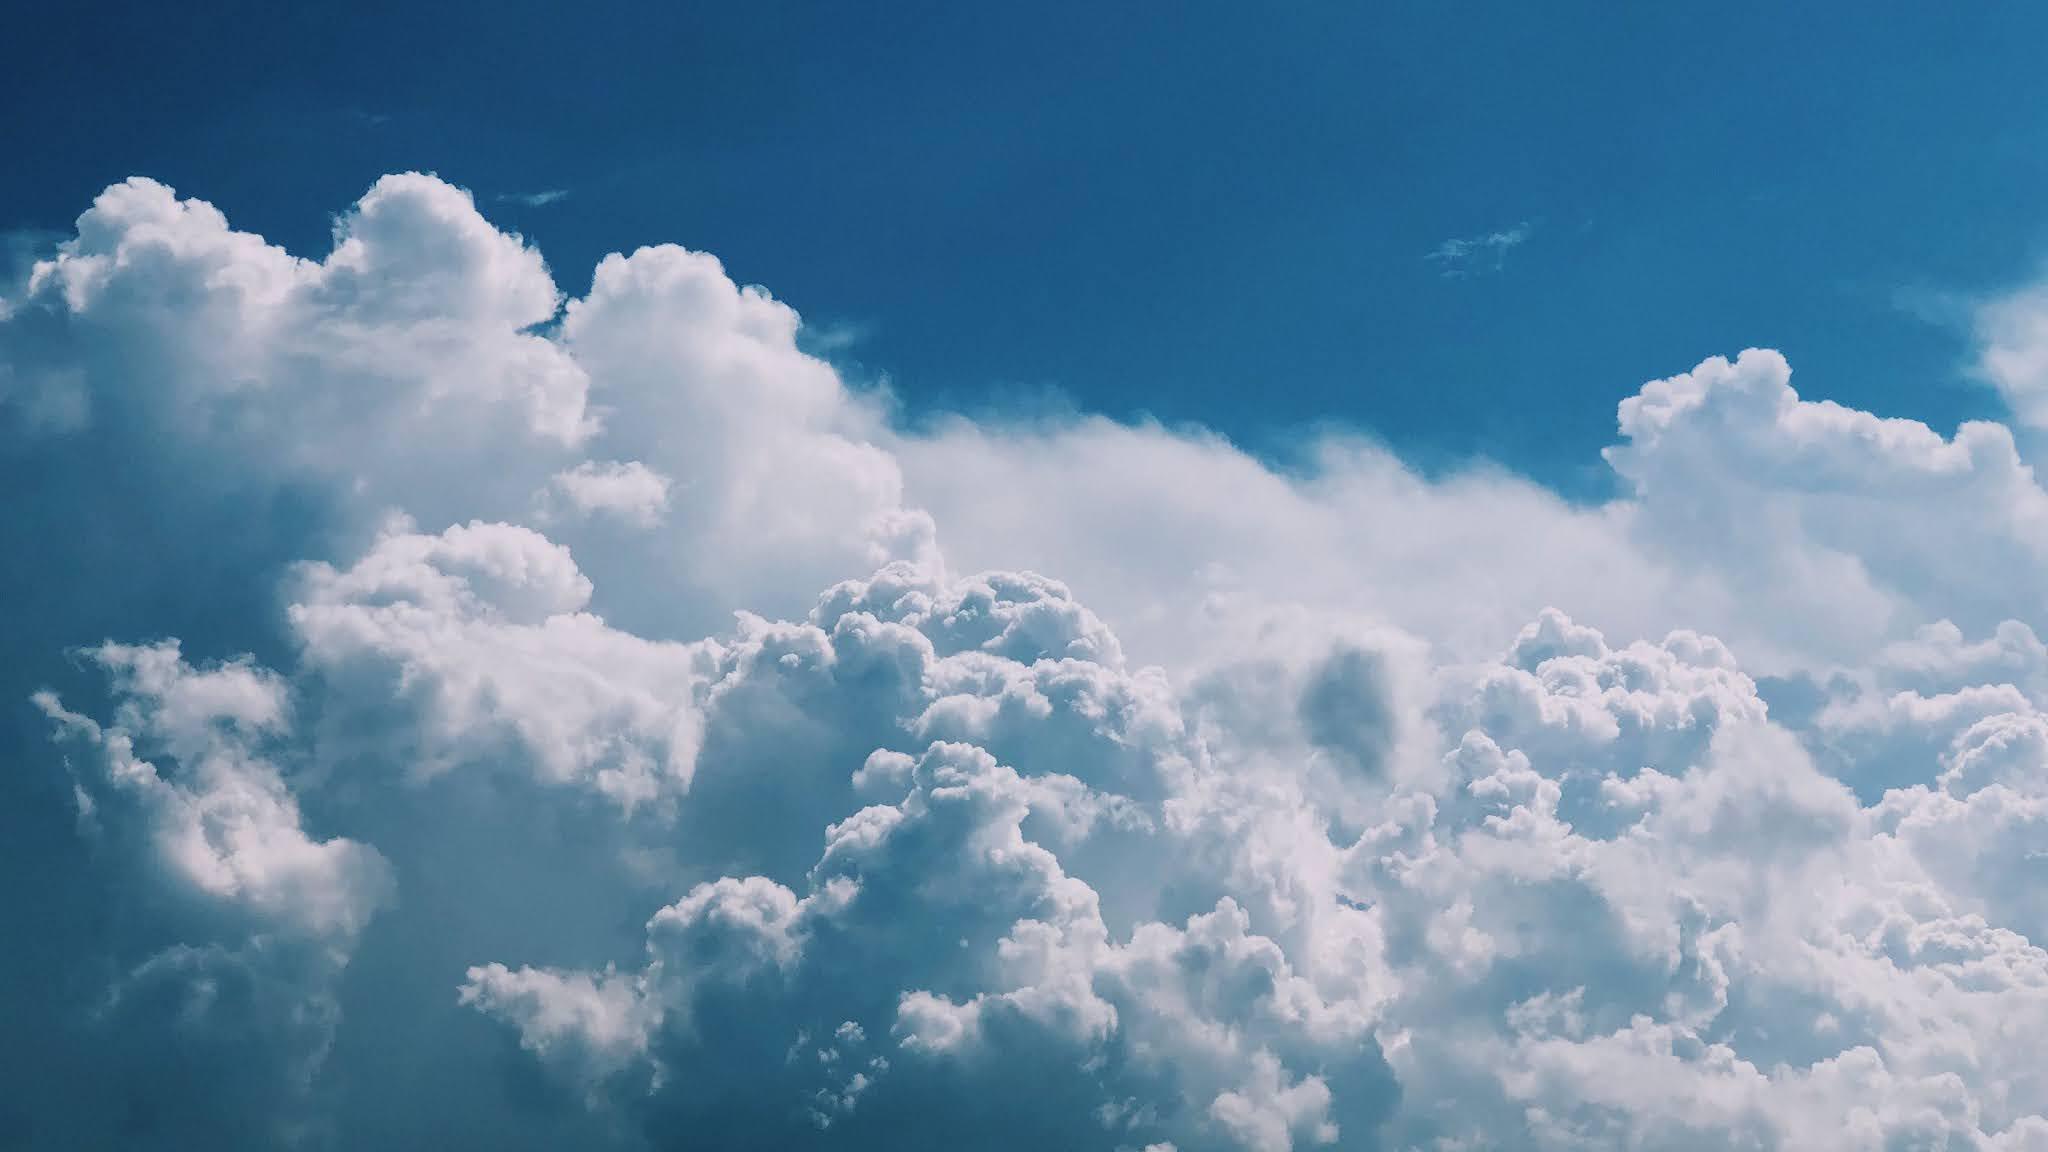 Wallpaper Beautiful Blue Sky Clouds